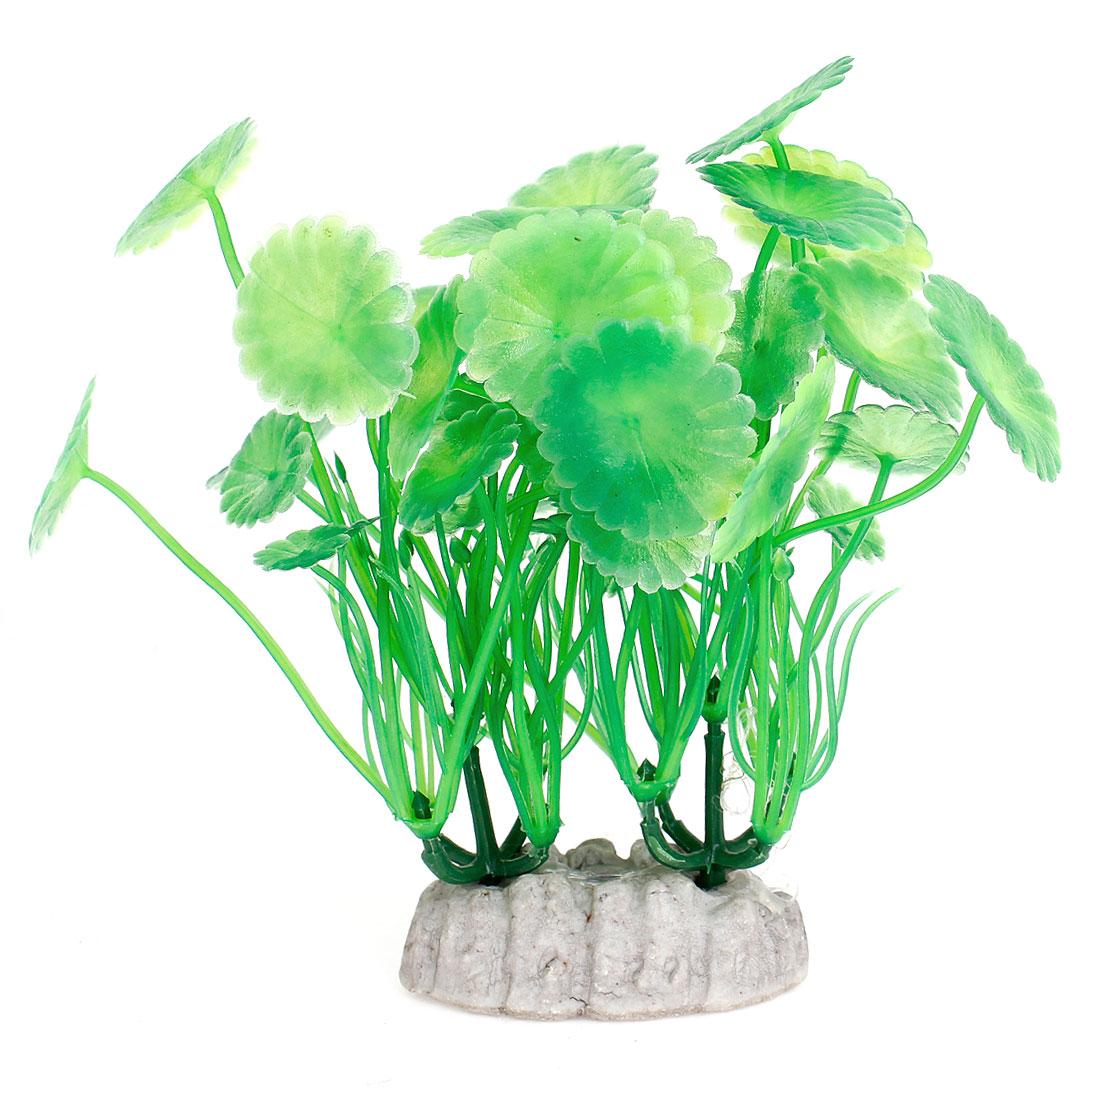 "4.7"" Height Green Artificial Manmade Aquarium Decoration Grass Plants 2PCS"